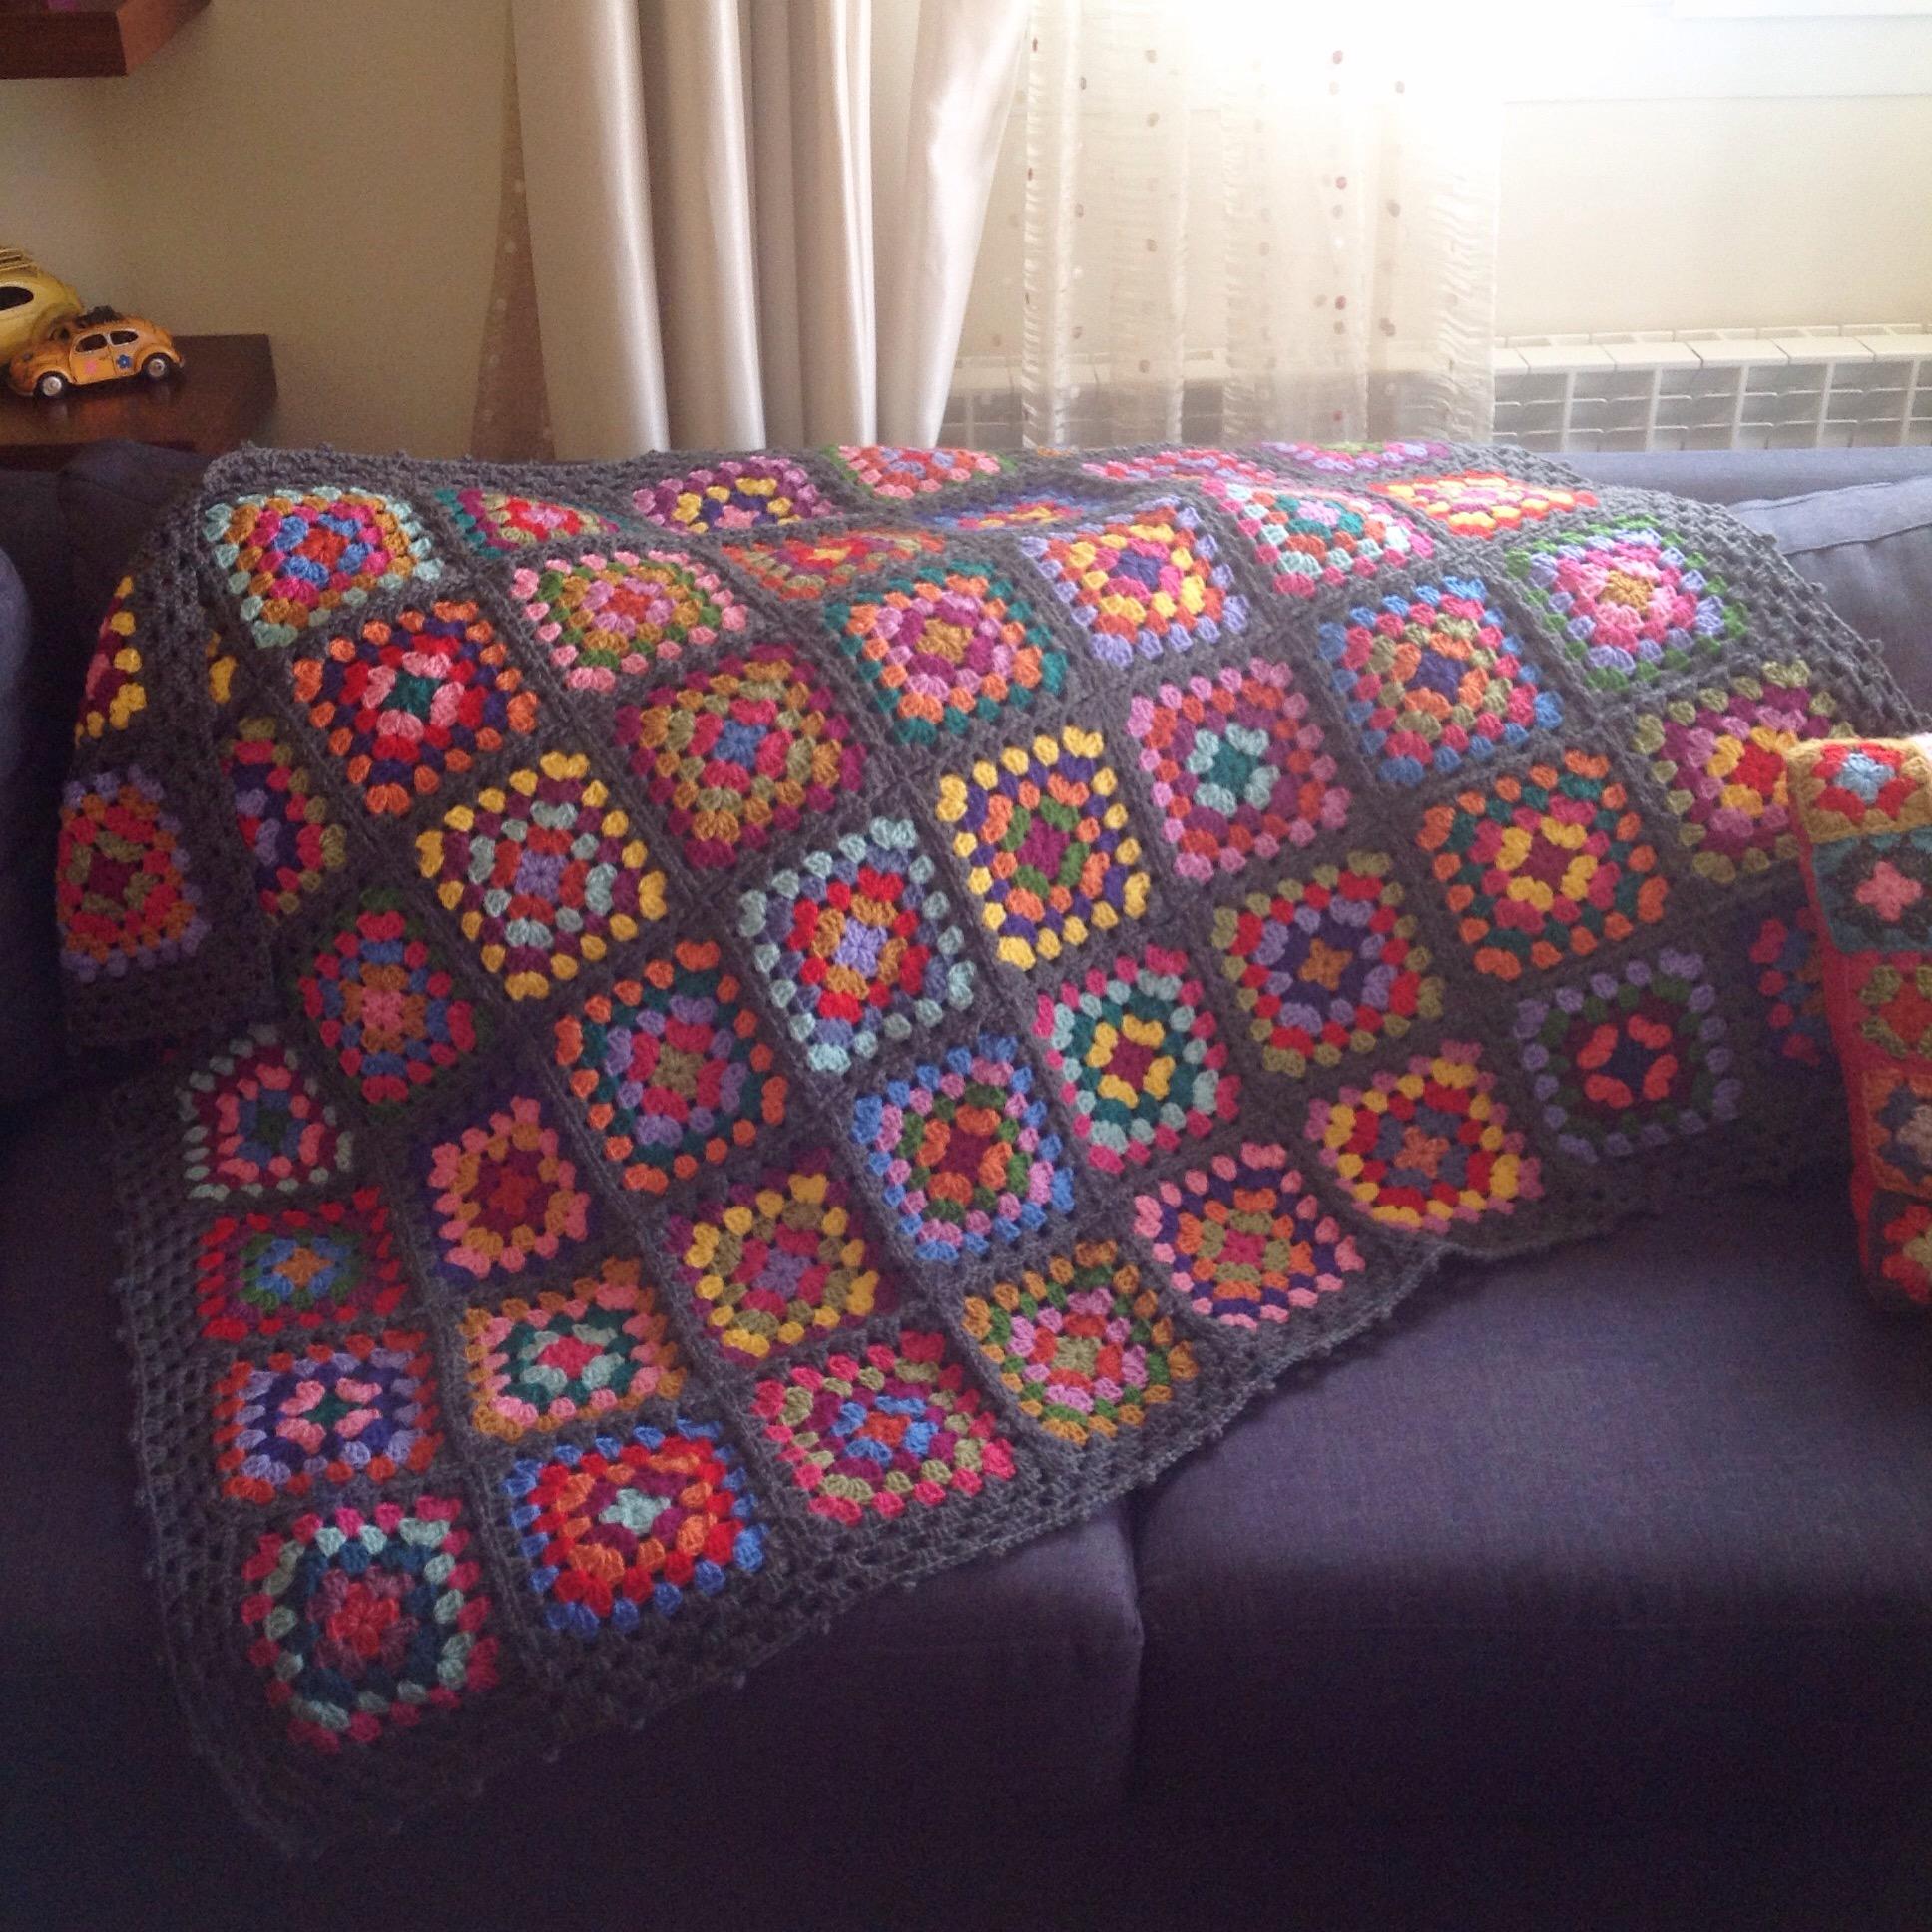 Blanket love ❤️💙💛💚💜